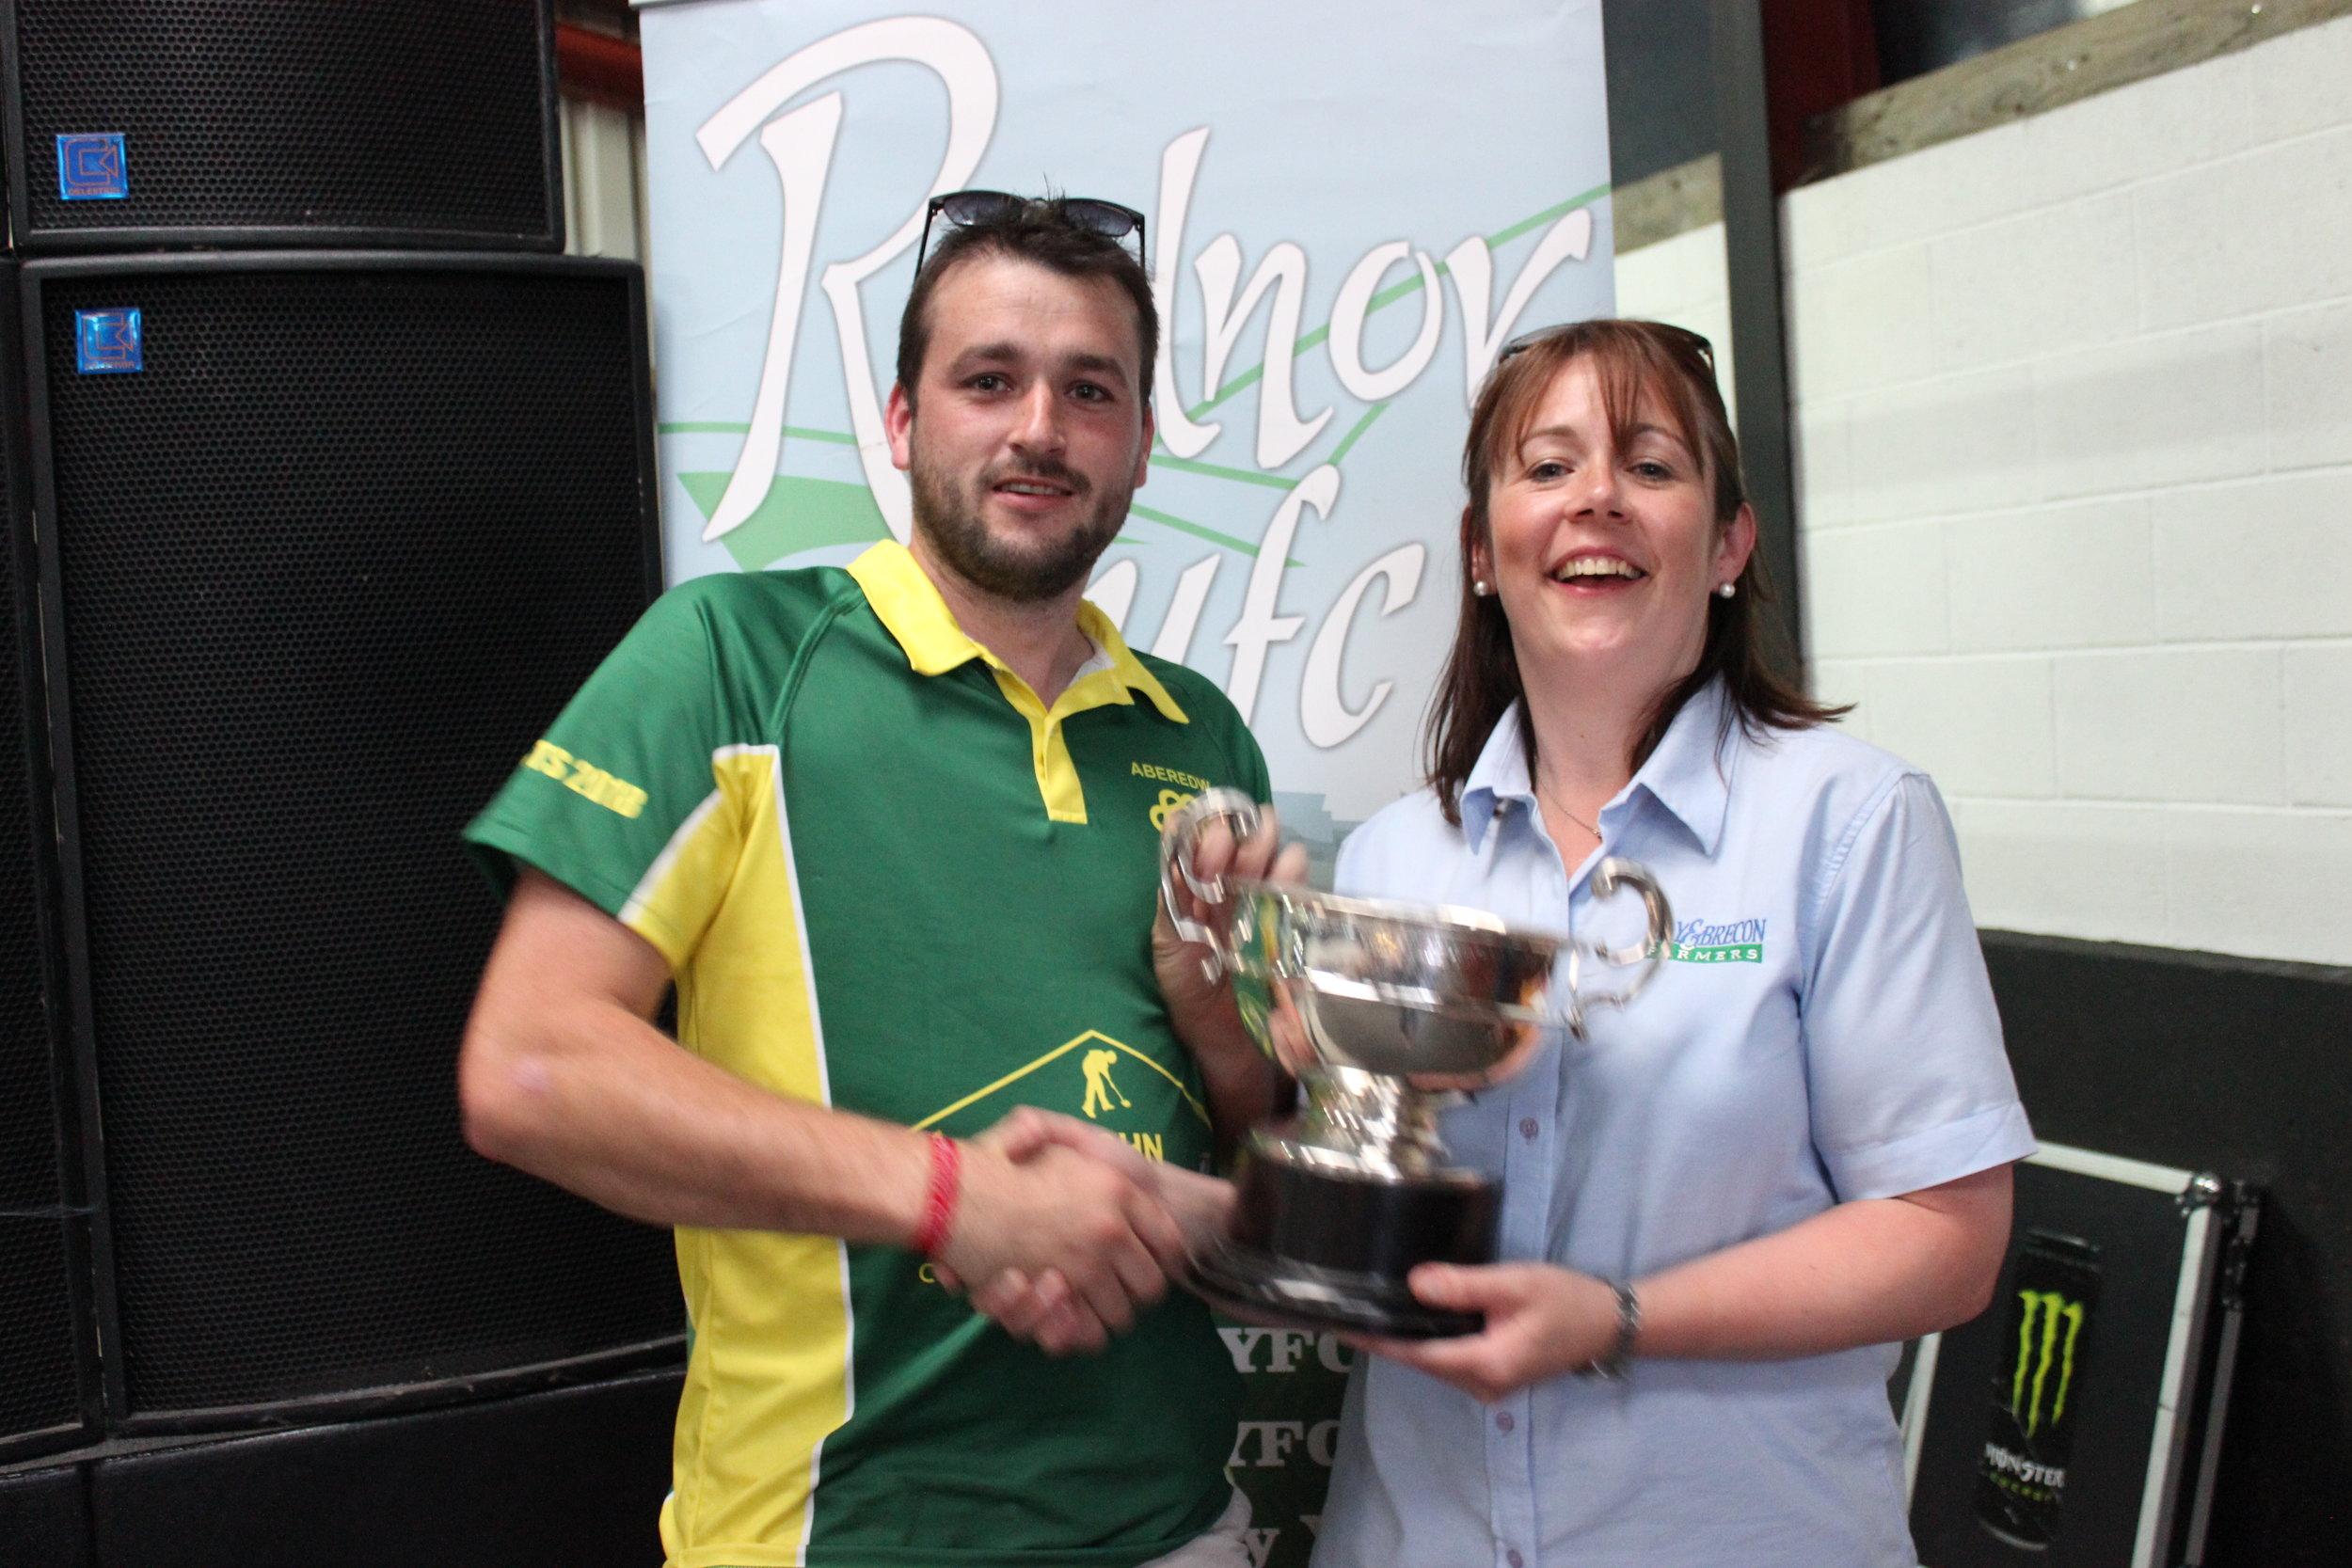 Adam Lewis, Aberedw YFC - Presteigne Agricultural Cup / Second placed Club